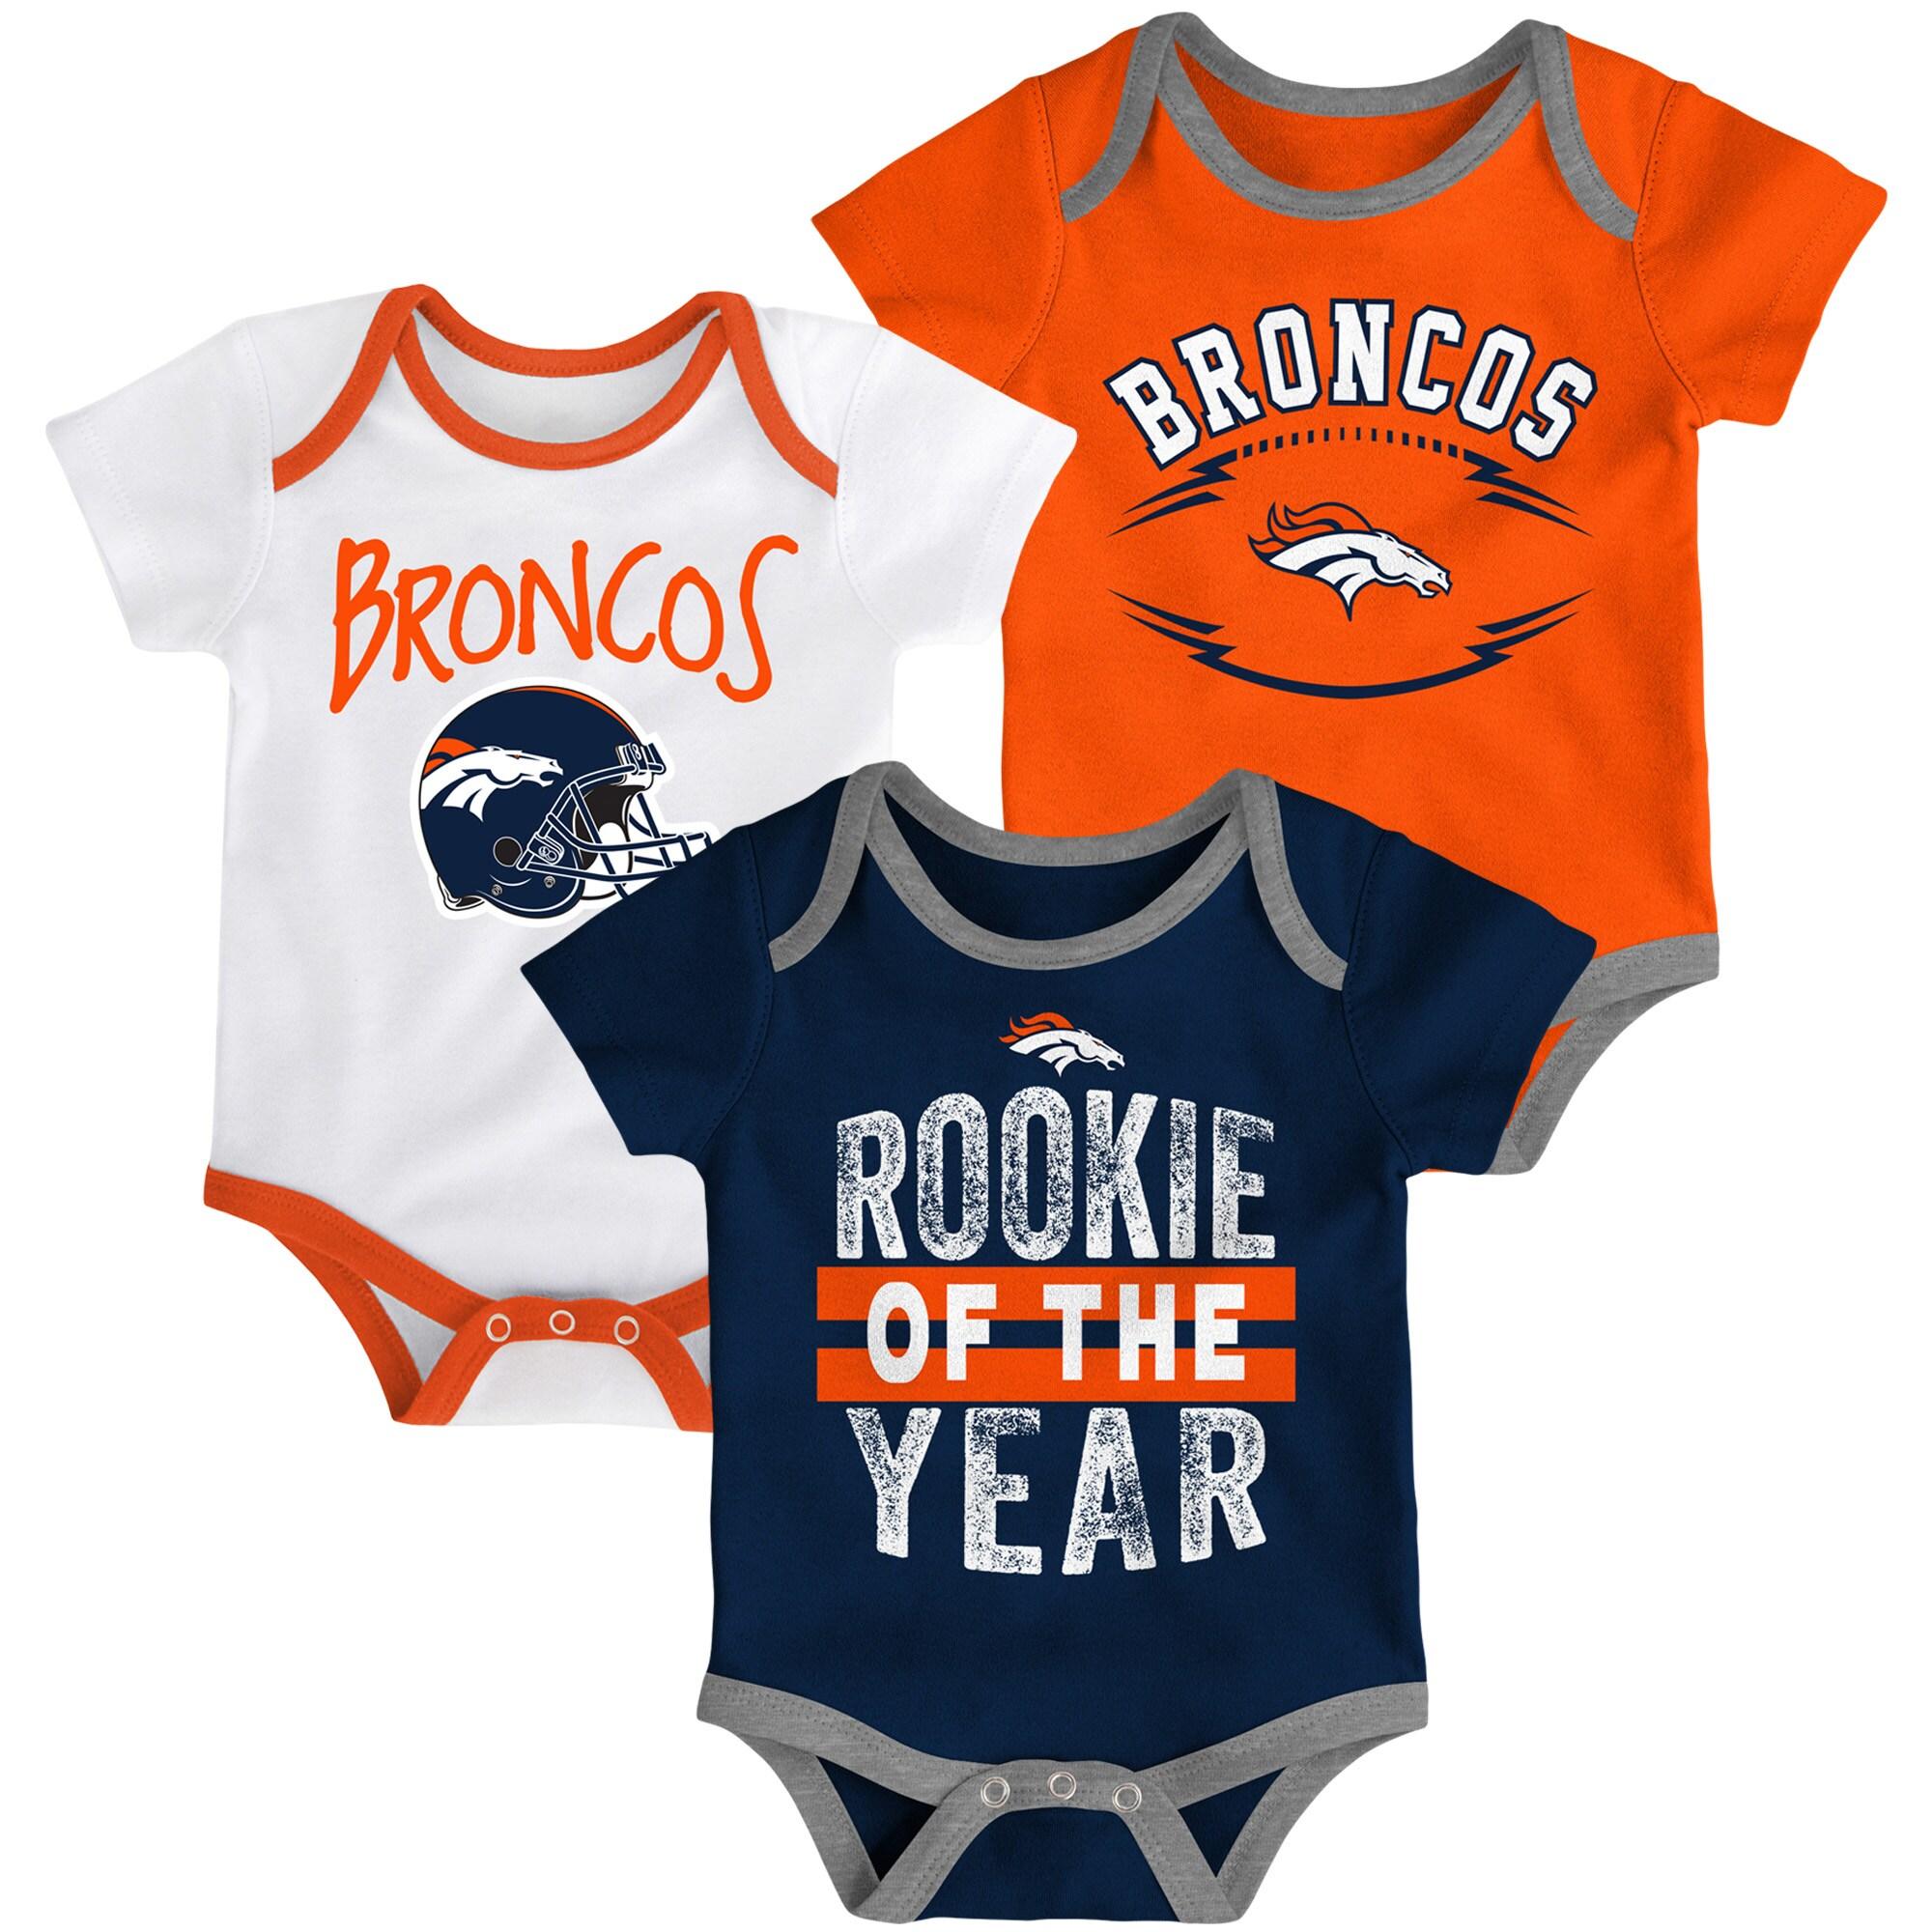 Denver Broncos Infant Kicking & Screaming Three-Piece Bodysuit Set - Orange/Navy/White